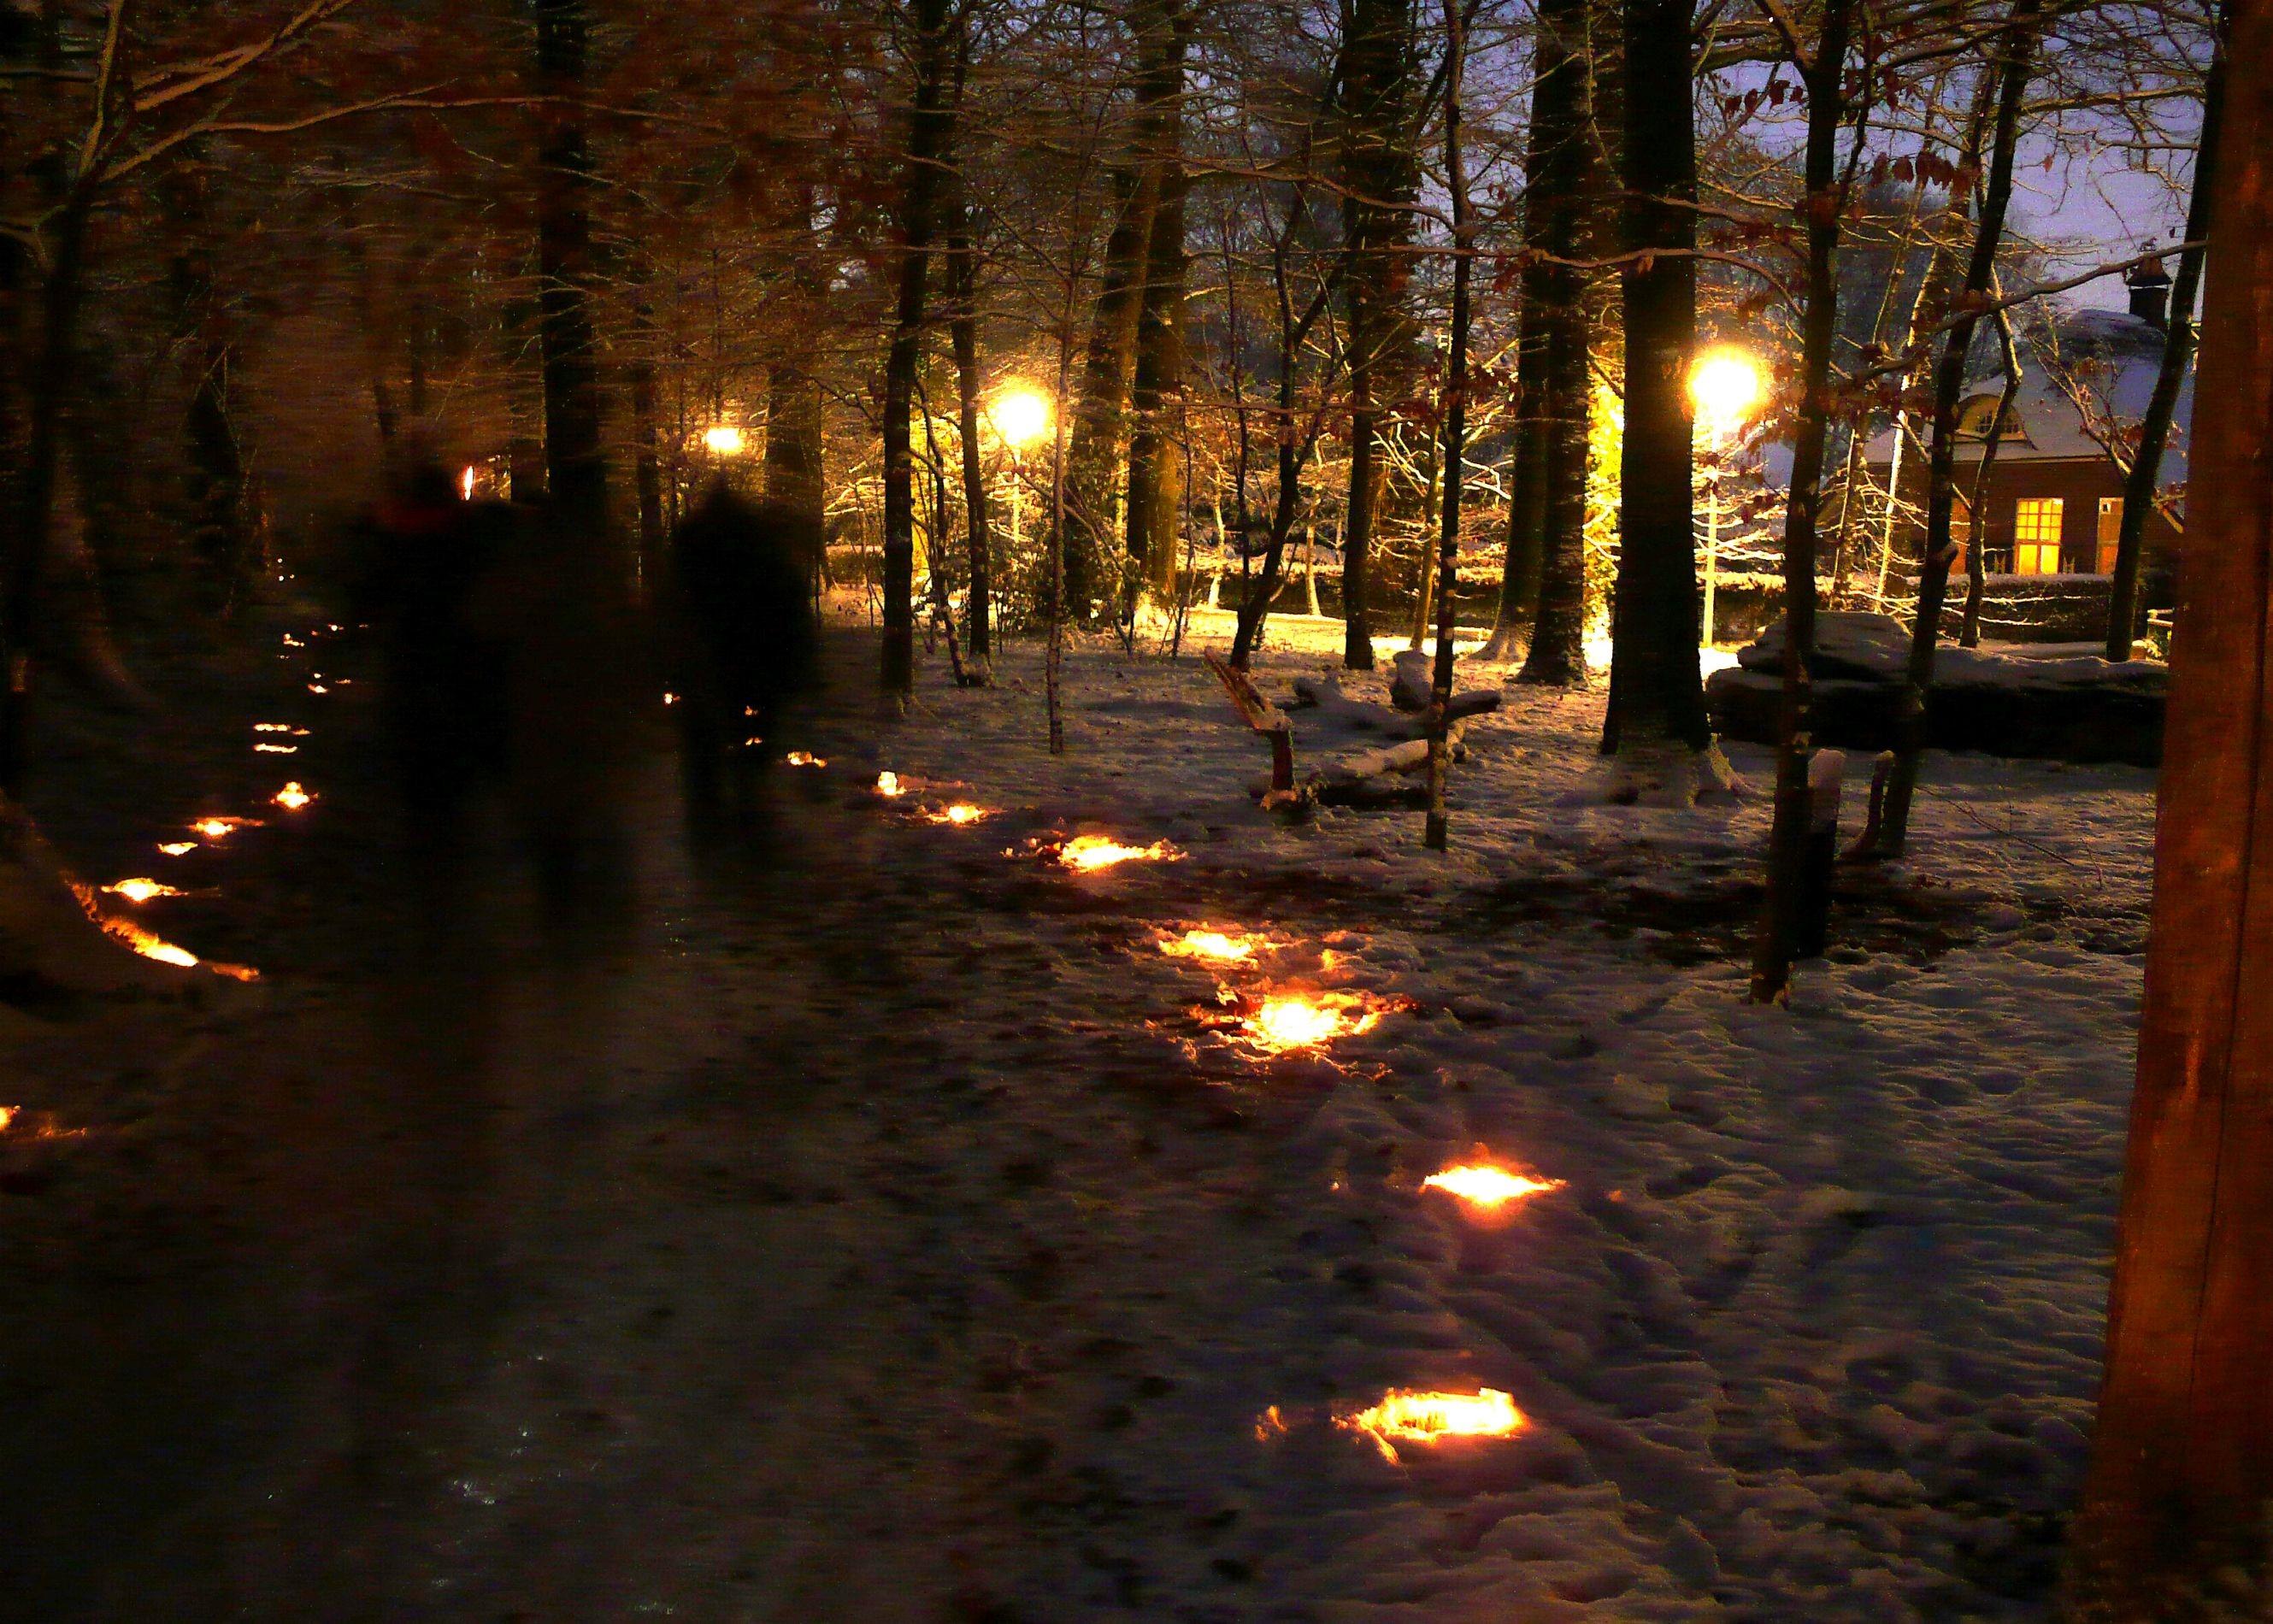 kerstverhaal, koor, Testify!, kerstlichtjestocht